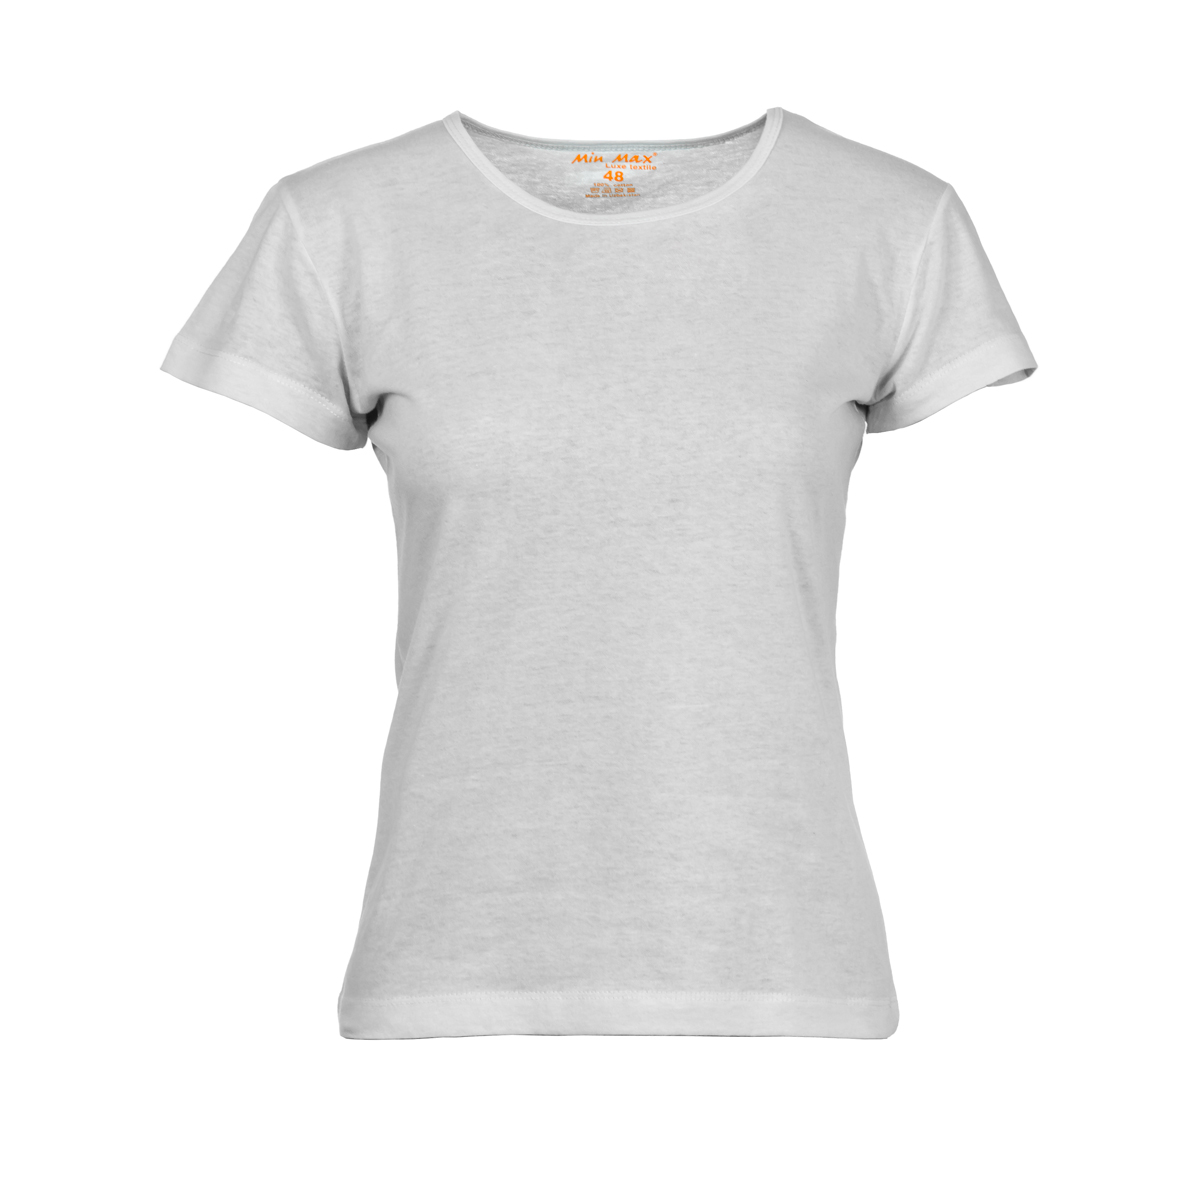 Жен. футболка арт. 04-0052 р. 56Майки и футболки<br>Фактический ОГ:102 см<br>Фактический ОТ:96 см<br>Фактический ОБ:104 м<br>Длина по спинке:64 см<br>Рост:178-188 см<br><br>Тип: Жен. футболка<br>Размер: 56<br>Материал: Кулирка